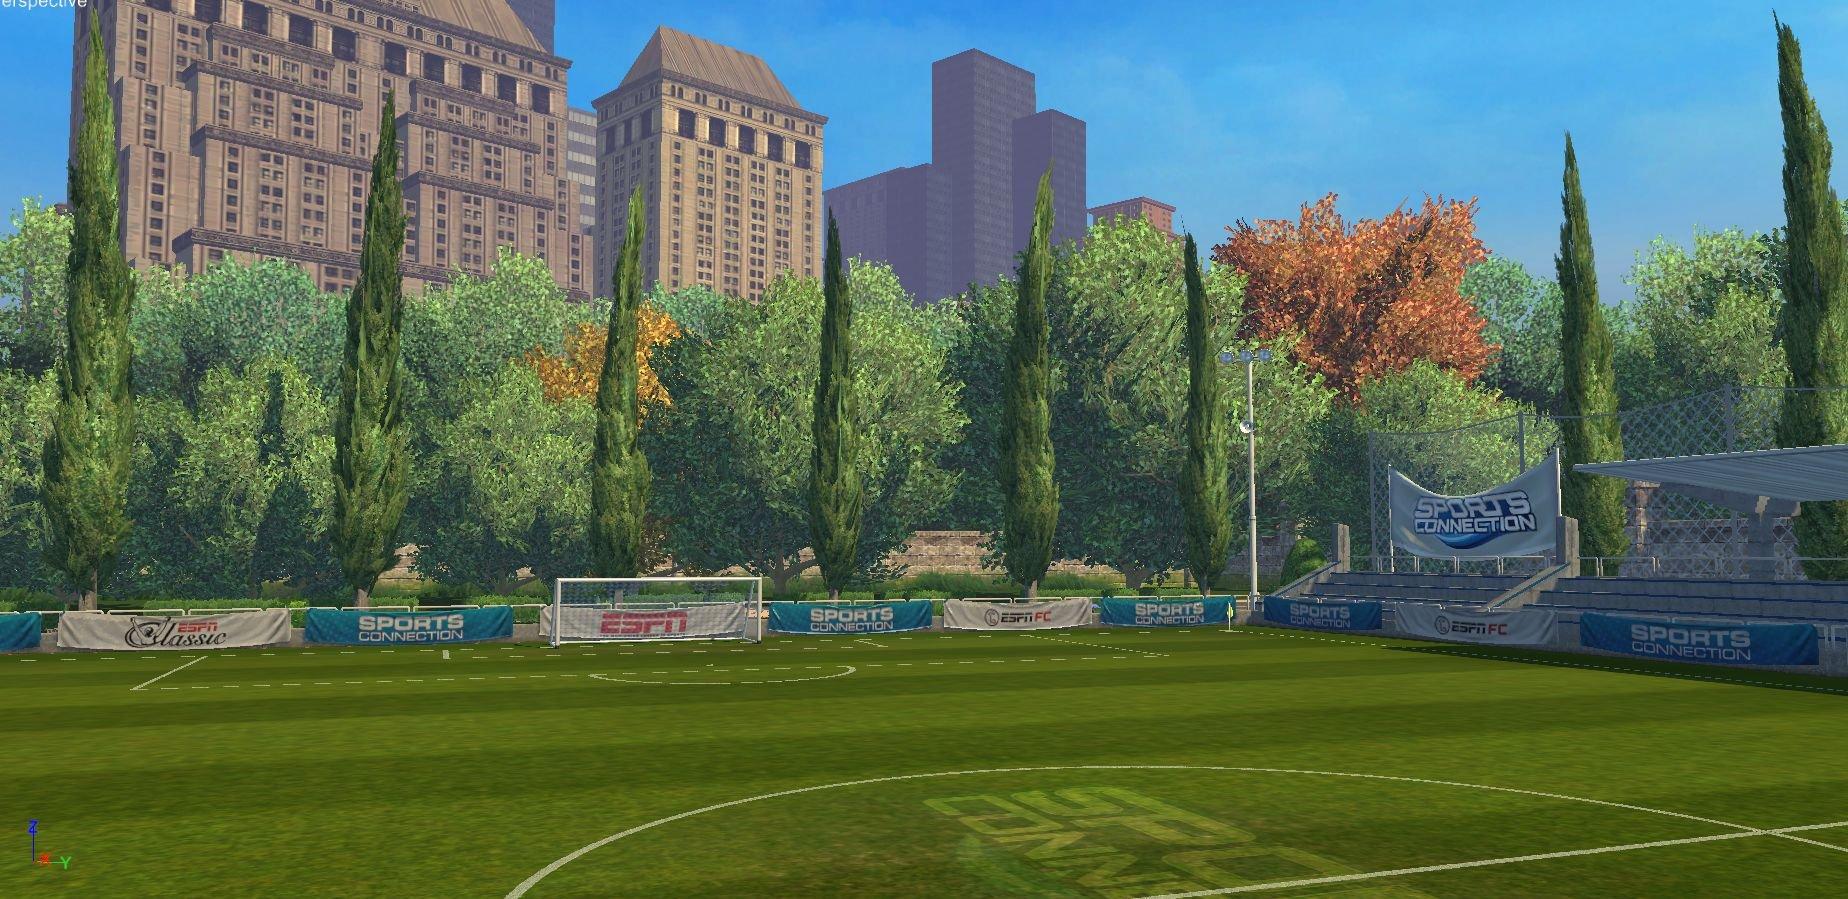 Pere balsach sc soccer 01 04